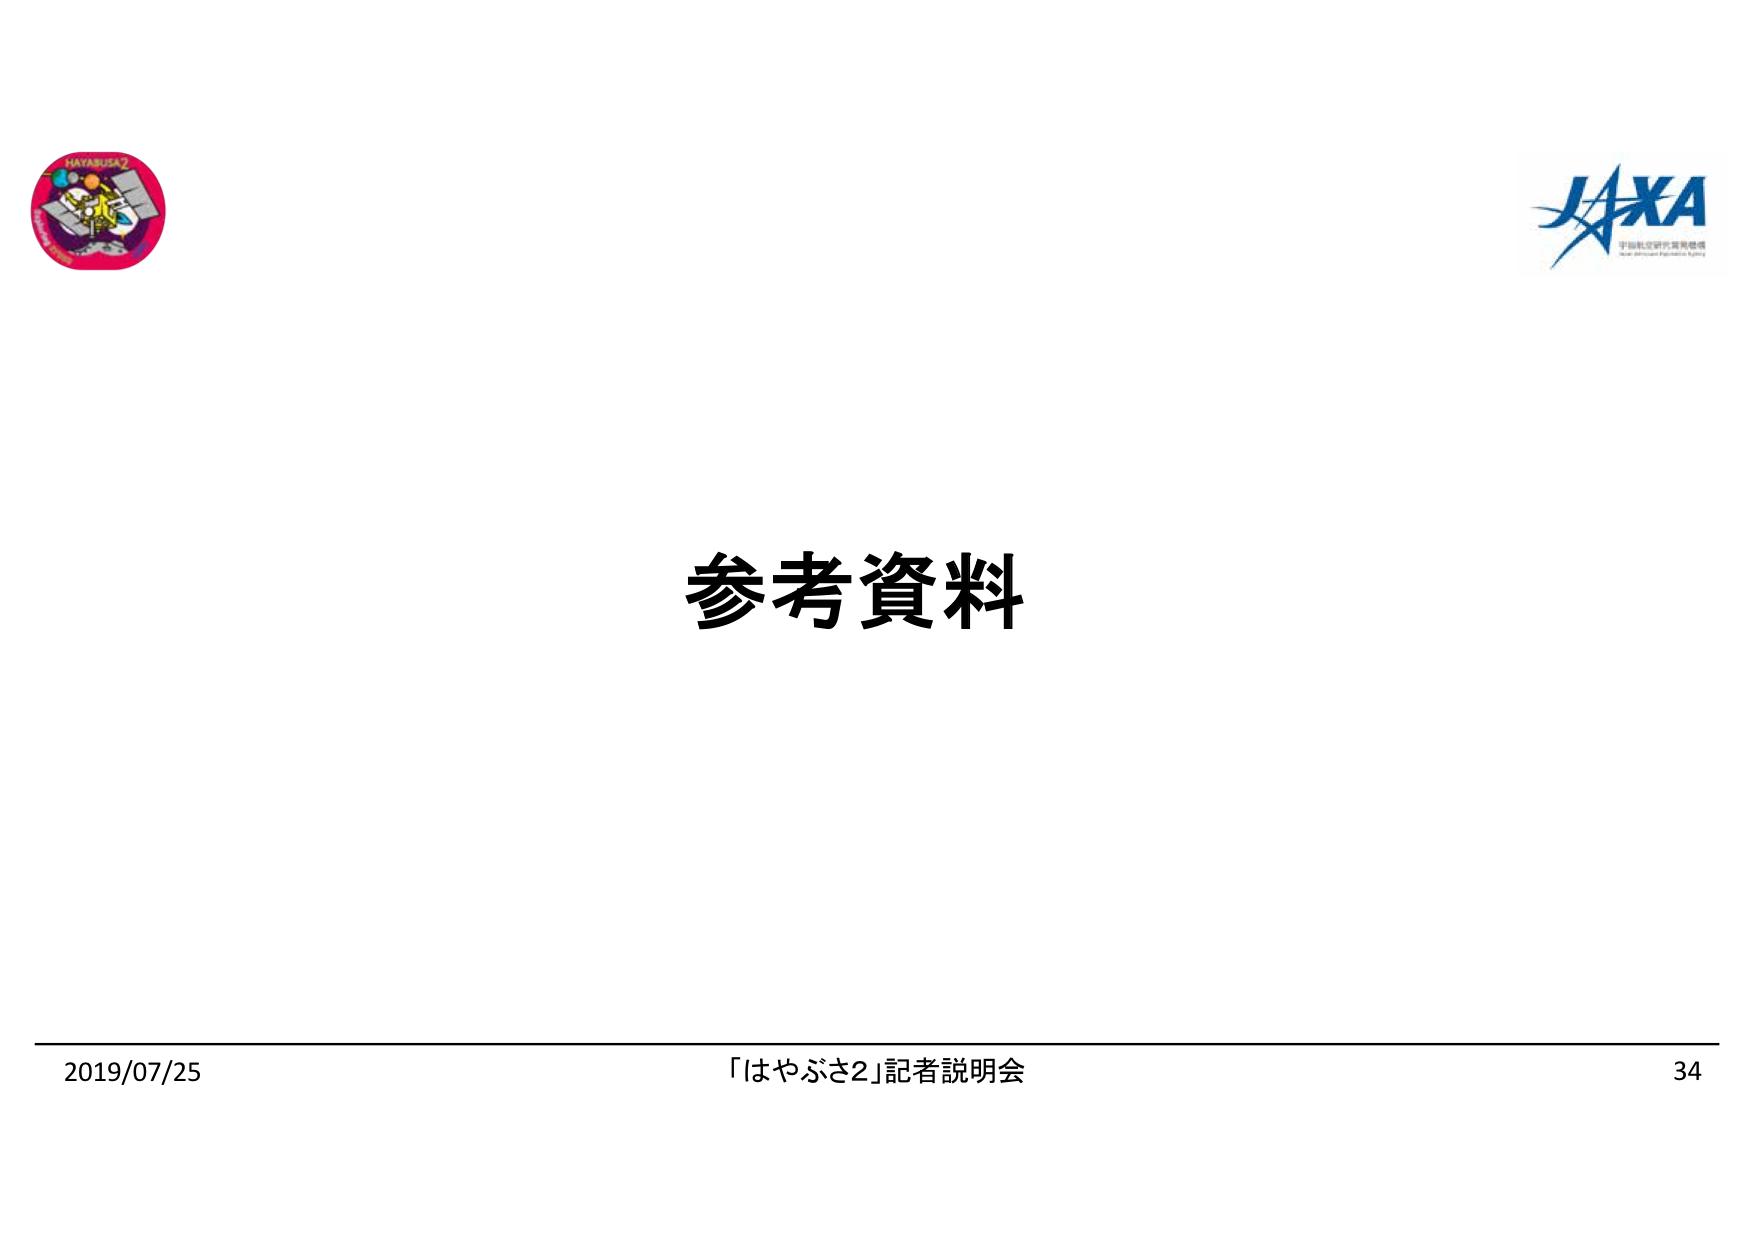 f:id:Imamura:20190725151422p:plain